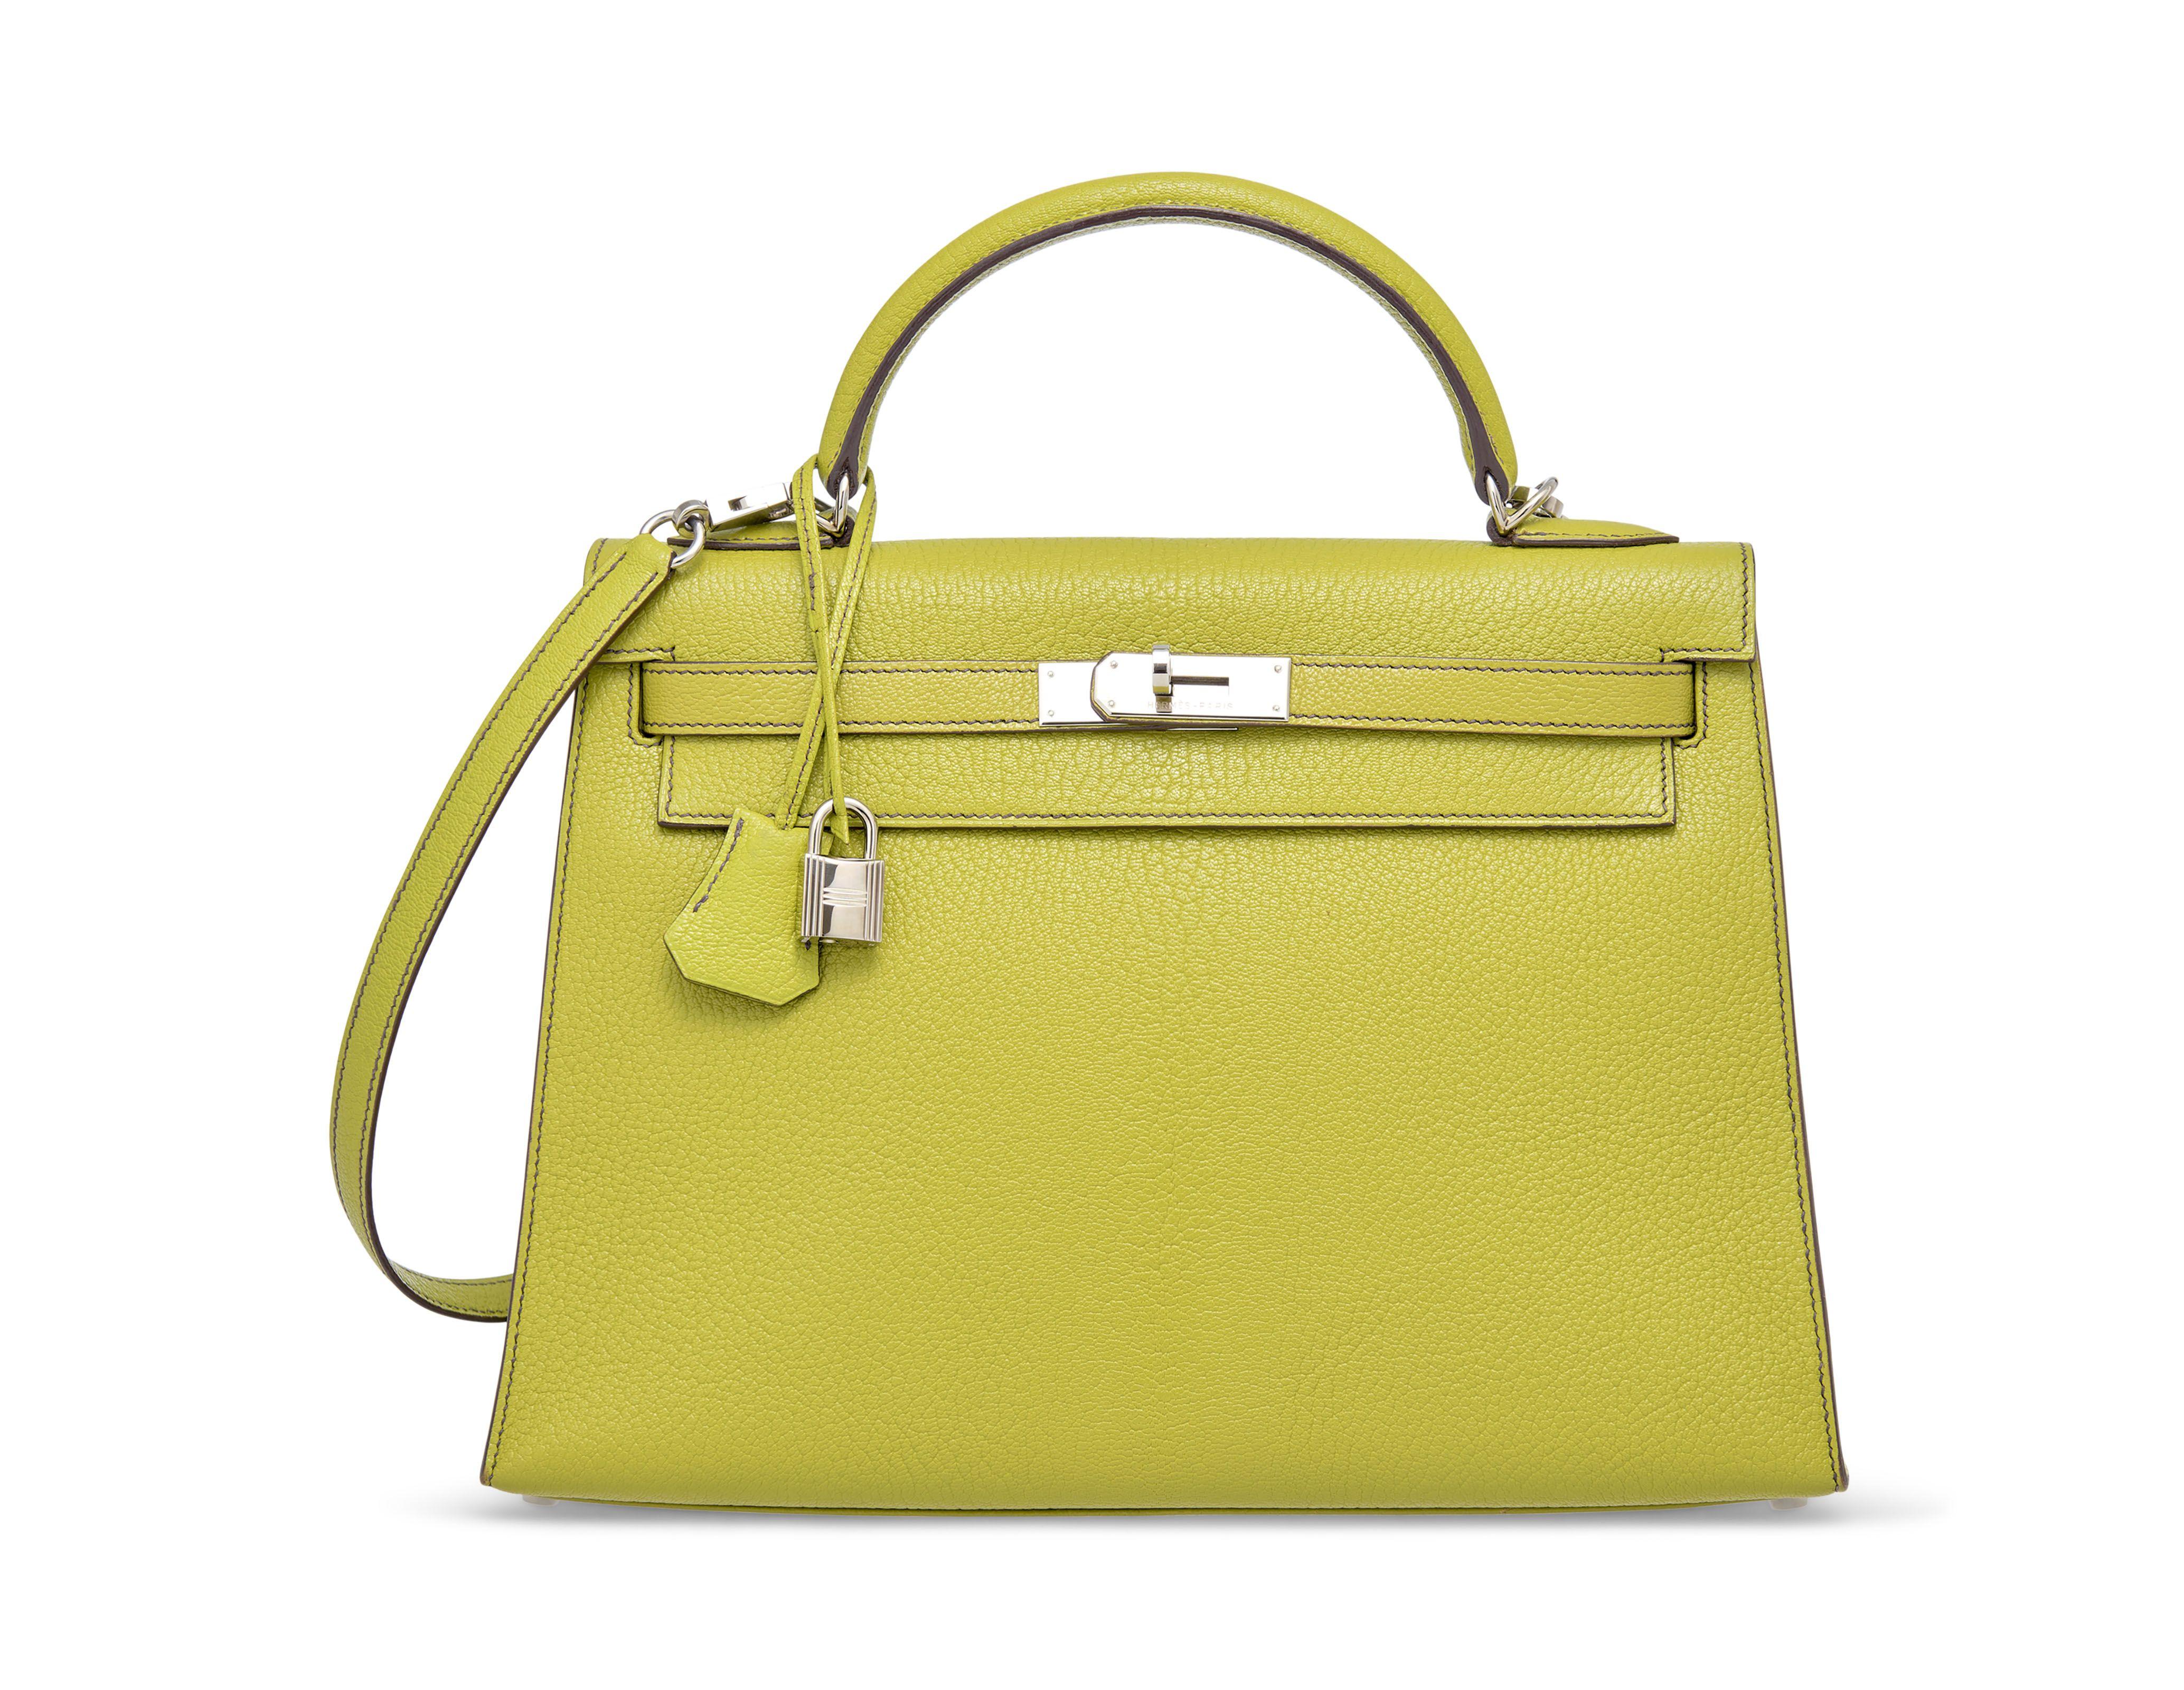 5b3c2b3819 AN AMBRE EPSOM LEATHER SELLIER KELLY 28 WITH PALLADIUM HARDWARE | HERMÈS,  2018 | 21st Century, bags | Christie's | Handbag in 2019 | Hermes kelly bag,  ...